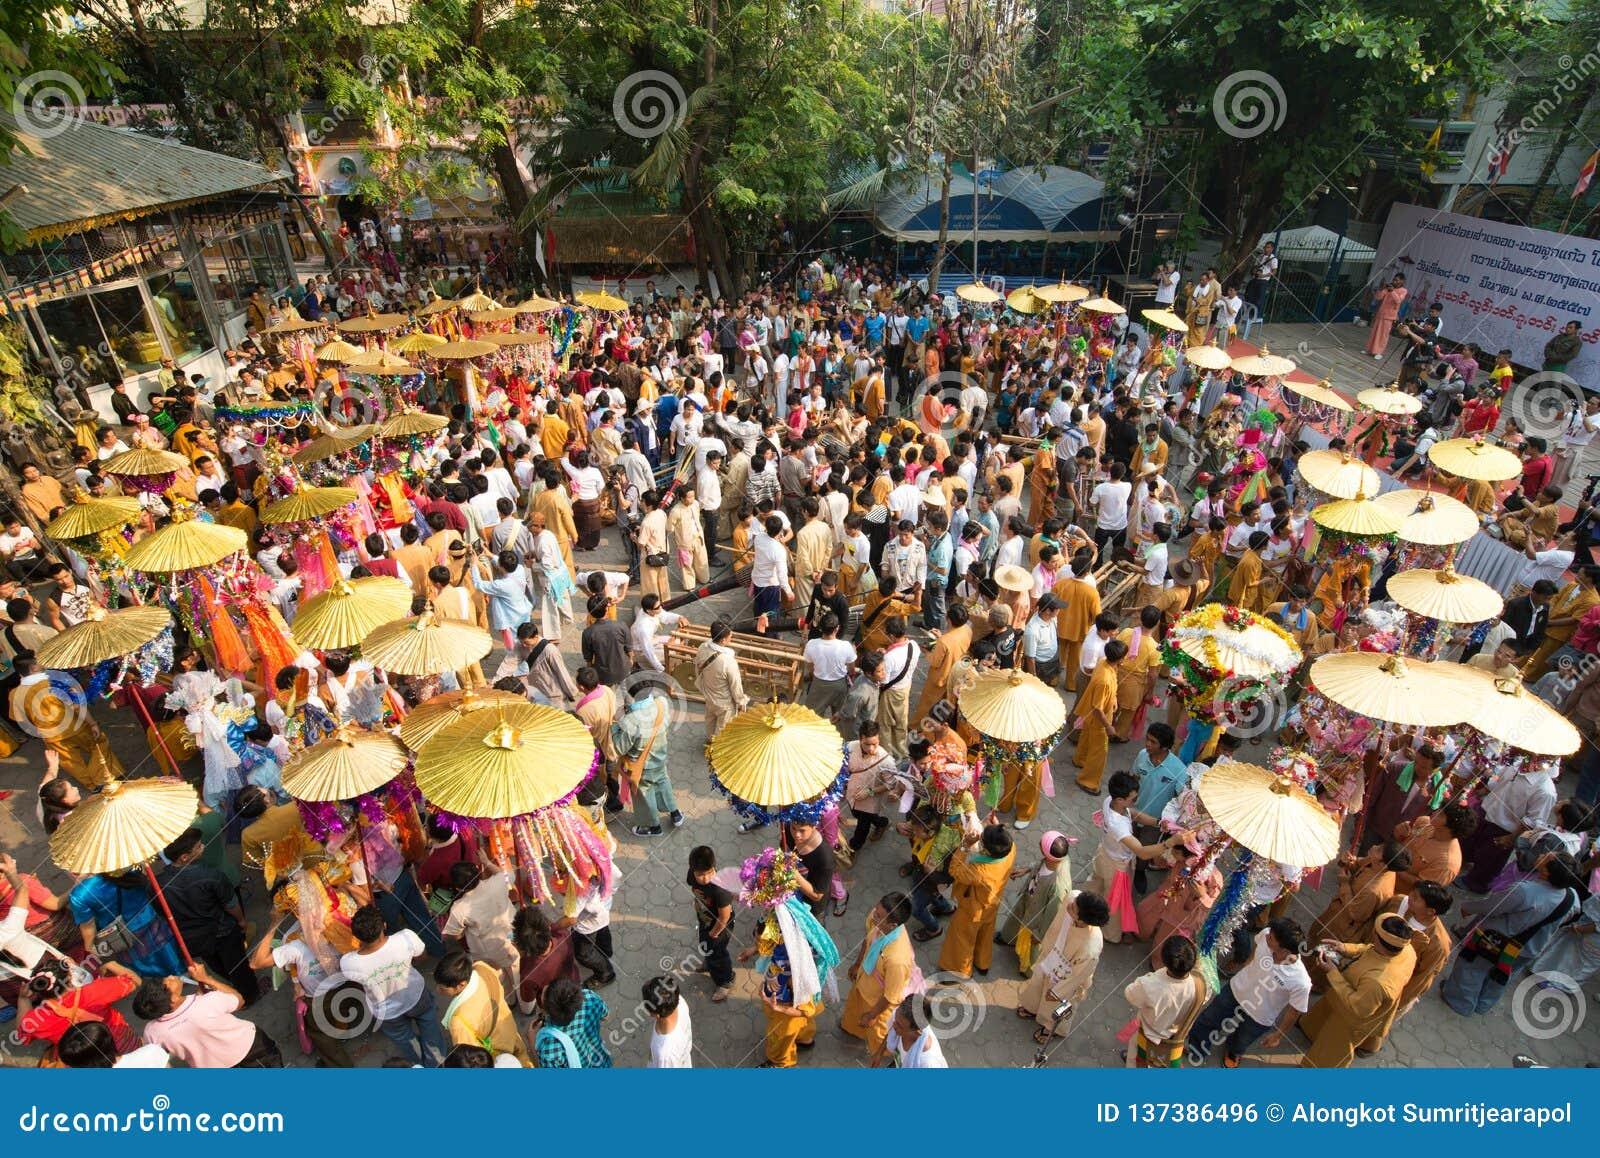 Poy在清迈唱长的节日,男孩仪式适合新手修士,游行的在寺庙附近,泰国